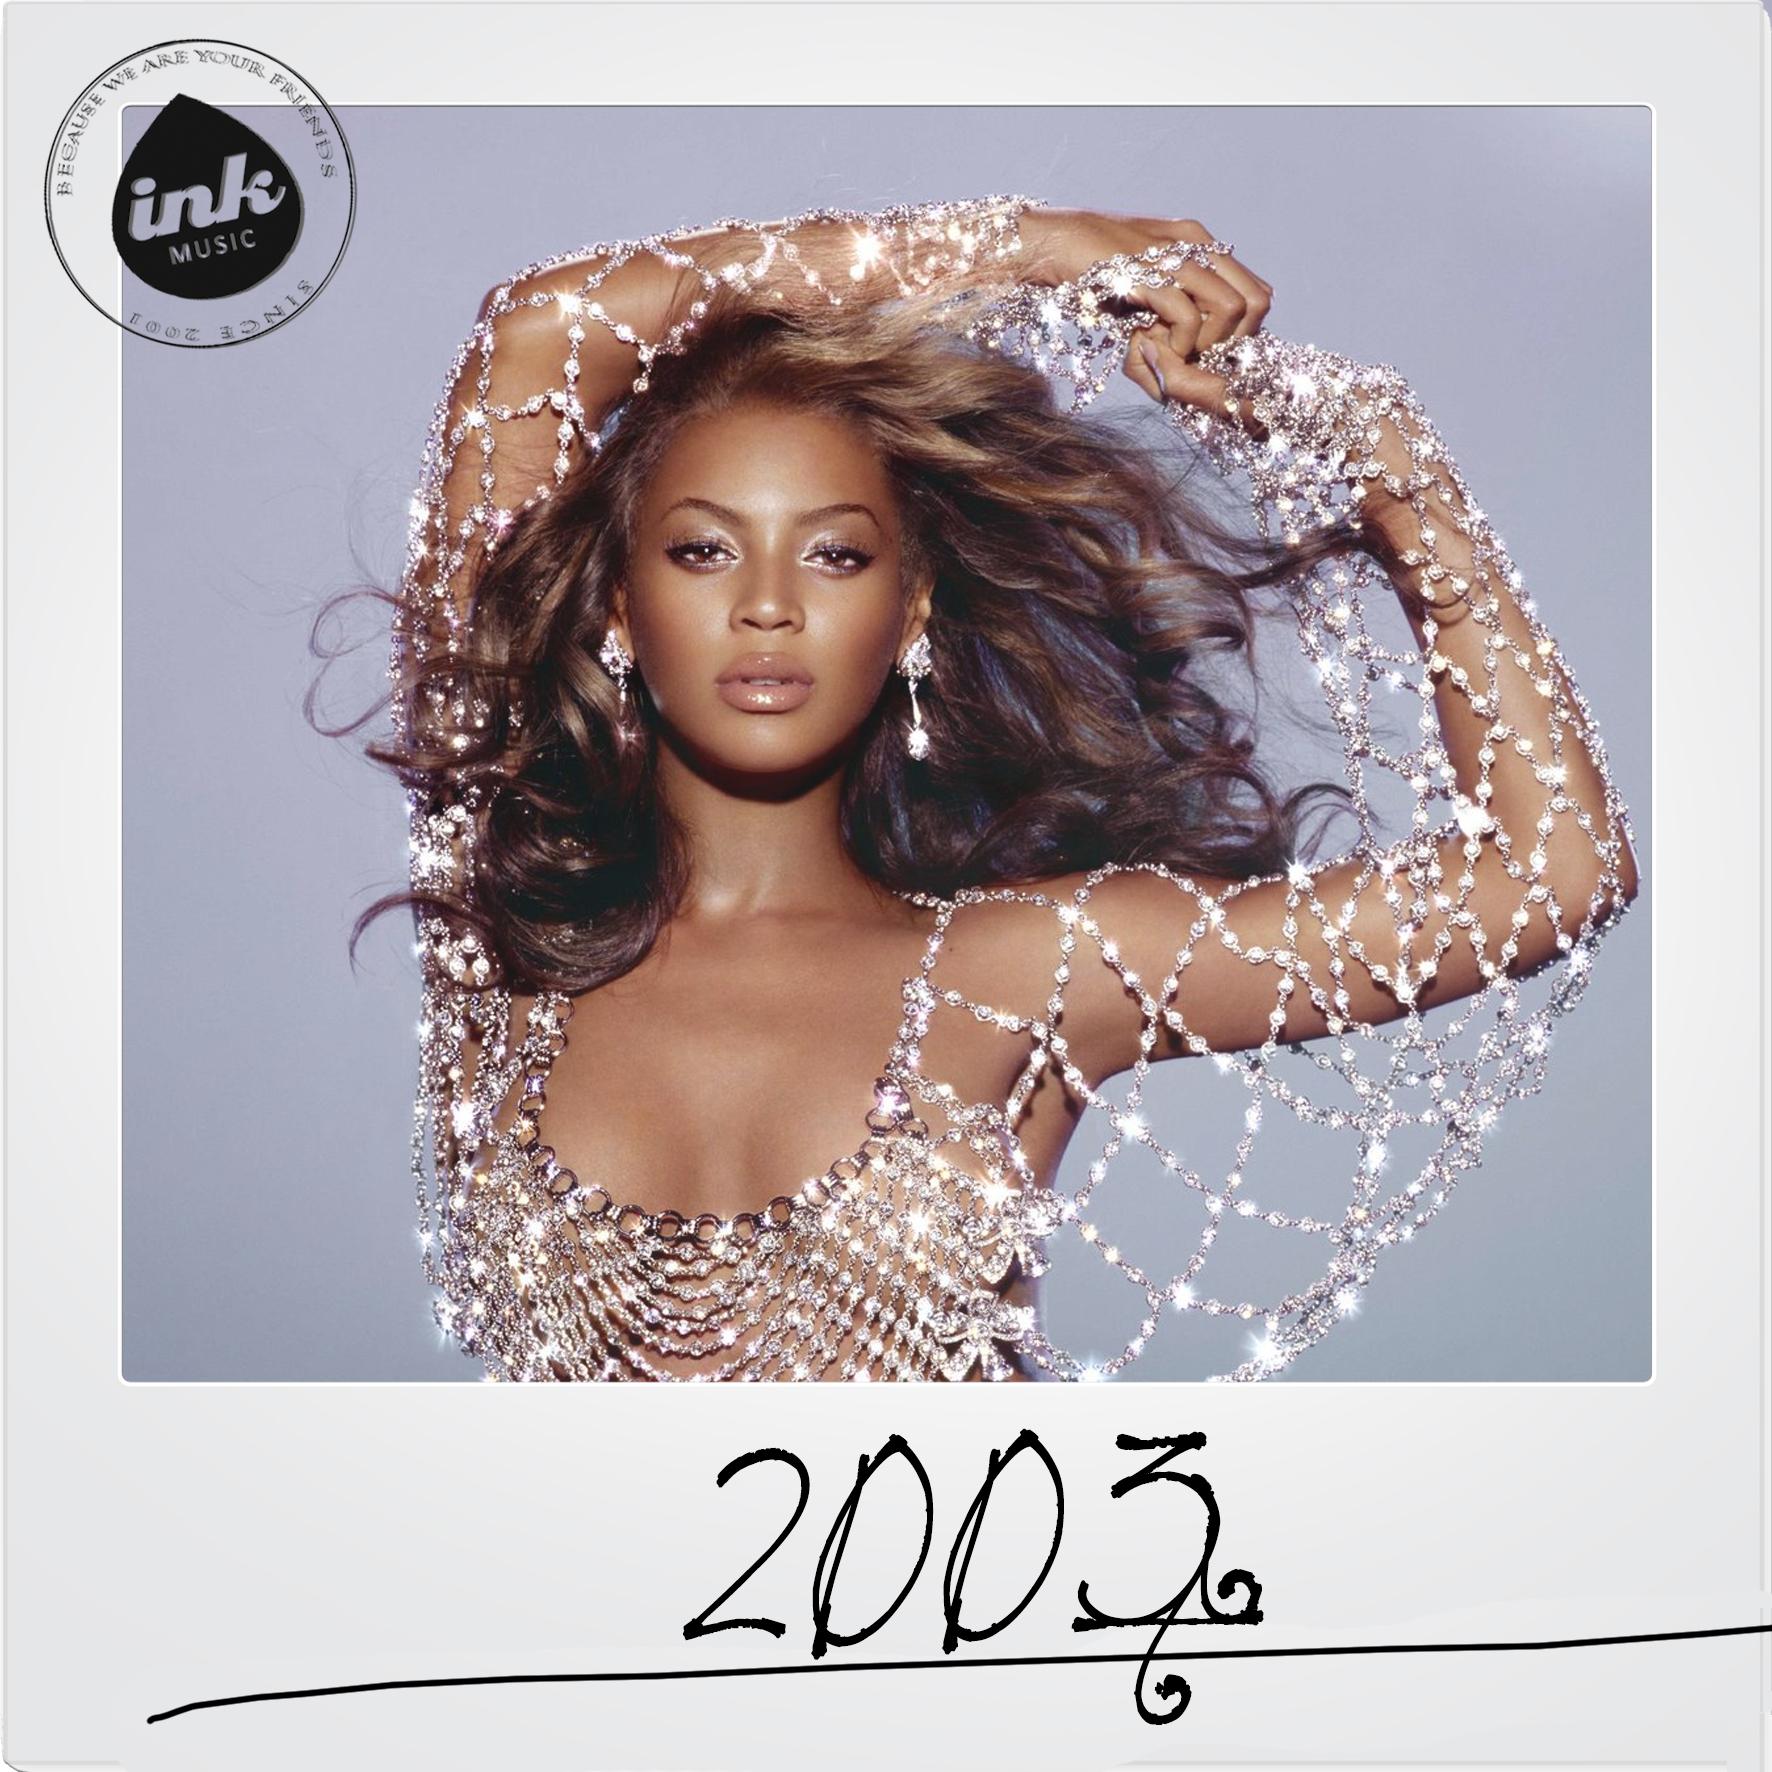 polaroid_spotify_yearlist-2003